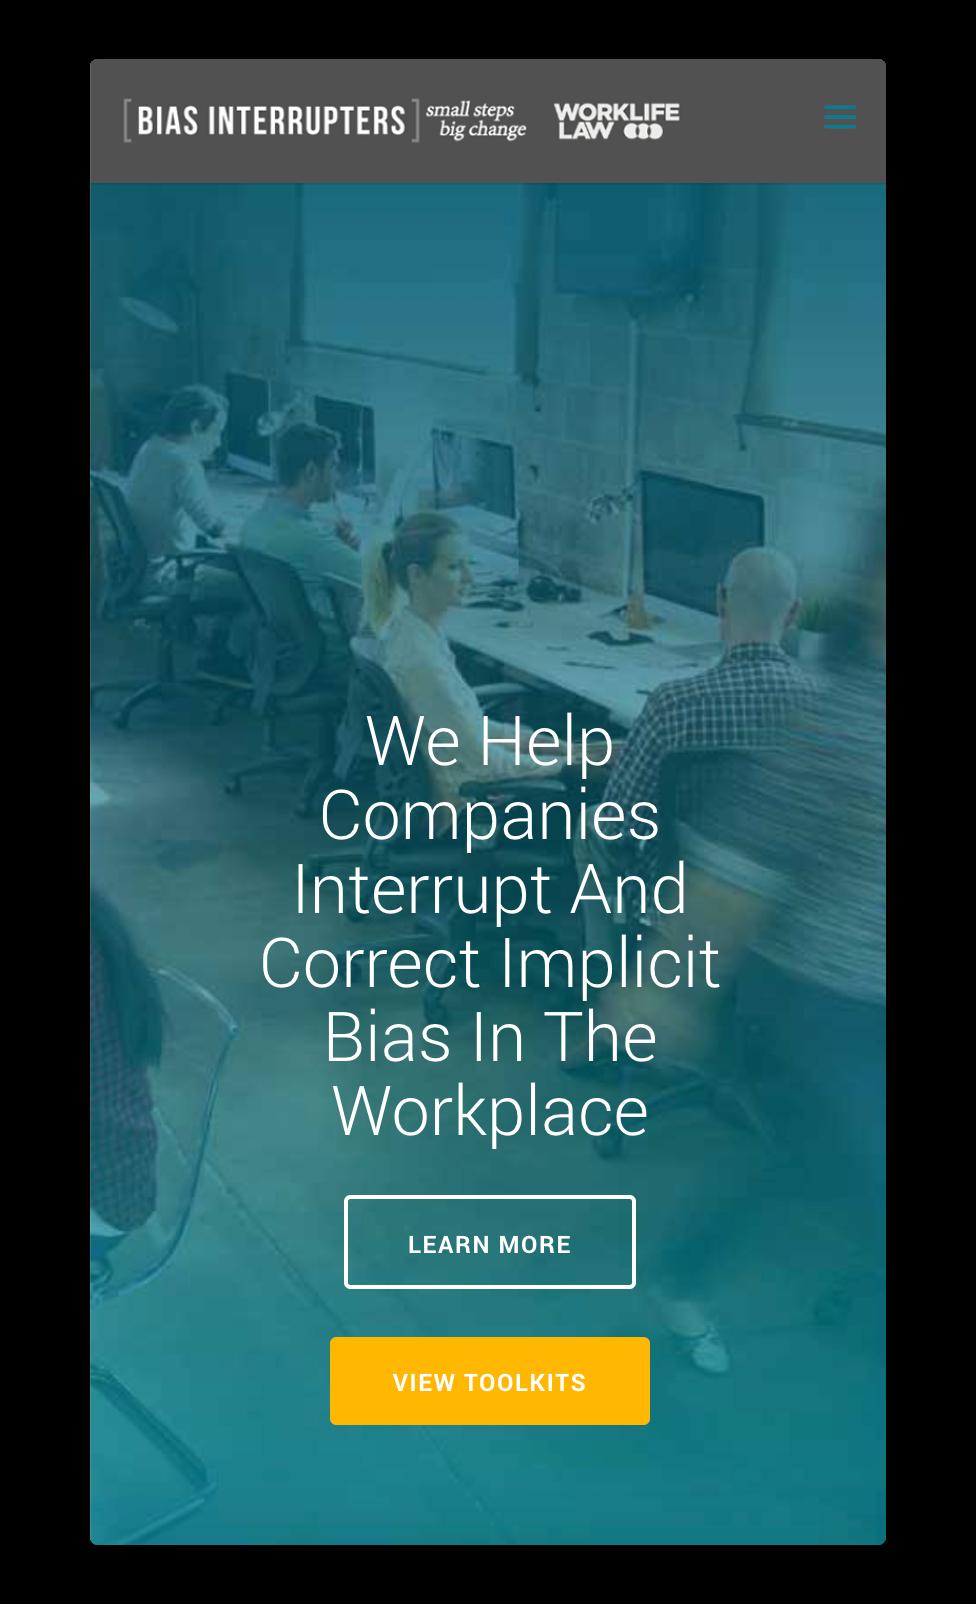 workplace life law marketing